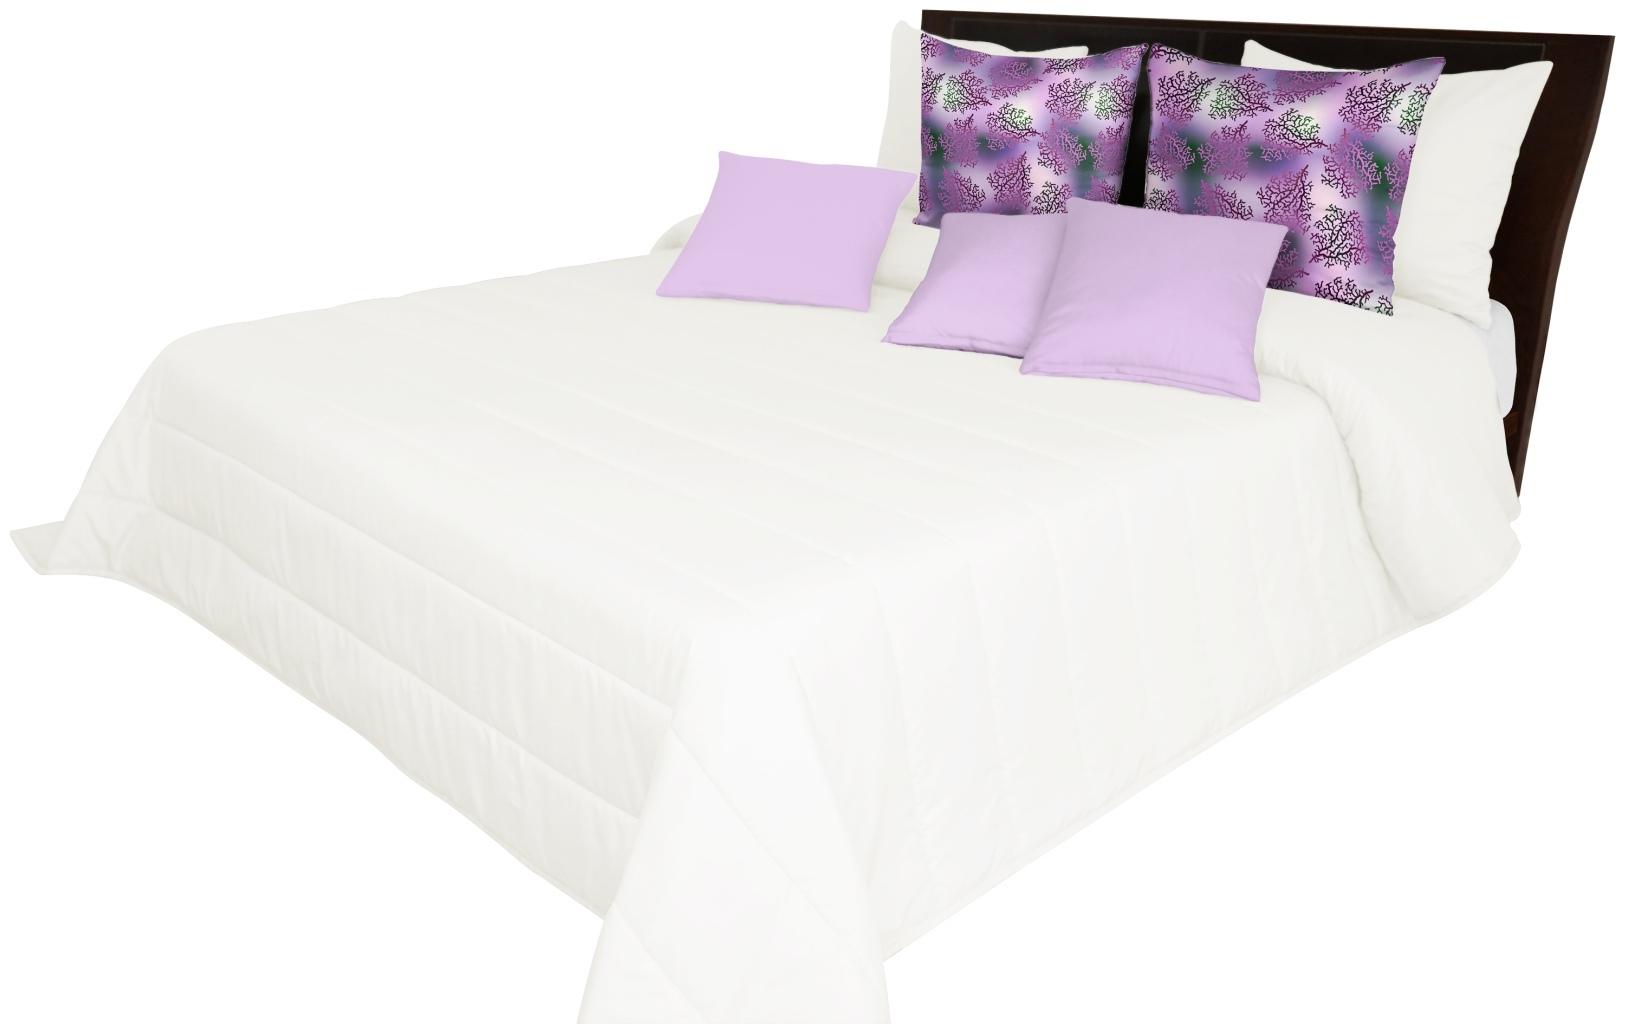 Narzuta pikowana na łóżko NMF-08 Mariall